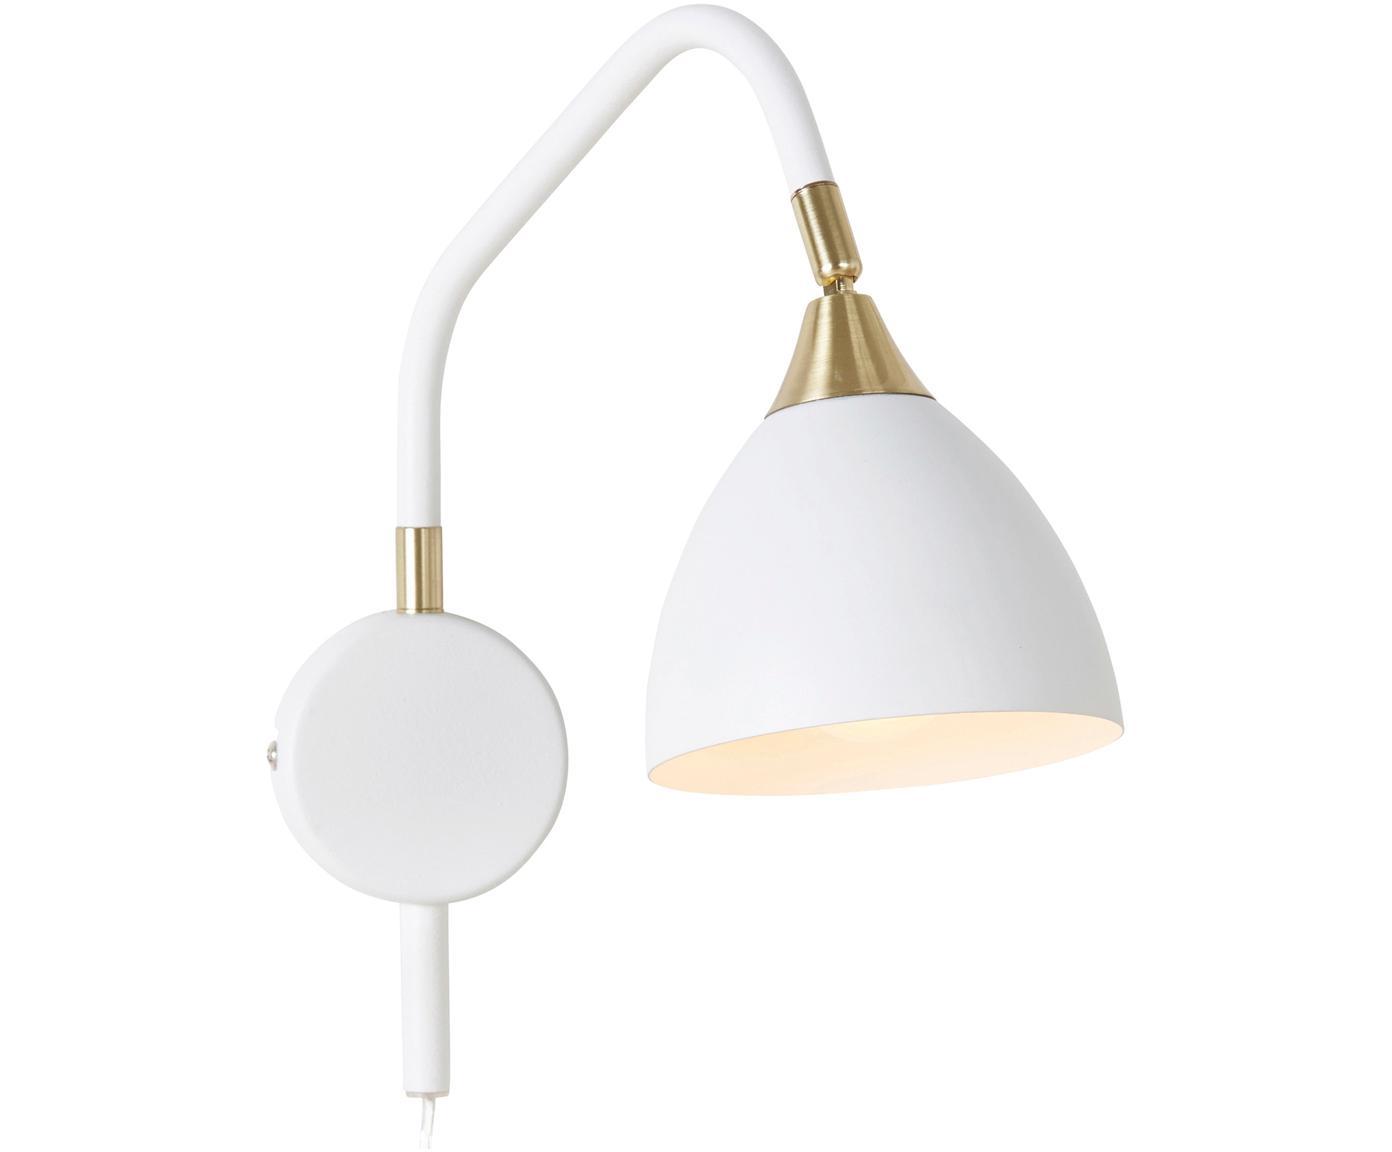 Aplique Luis, con enchufe, Cable: plástico, Blanco, latón, An 12 x Al 29 cm